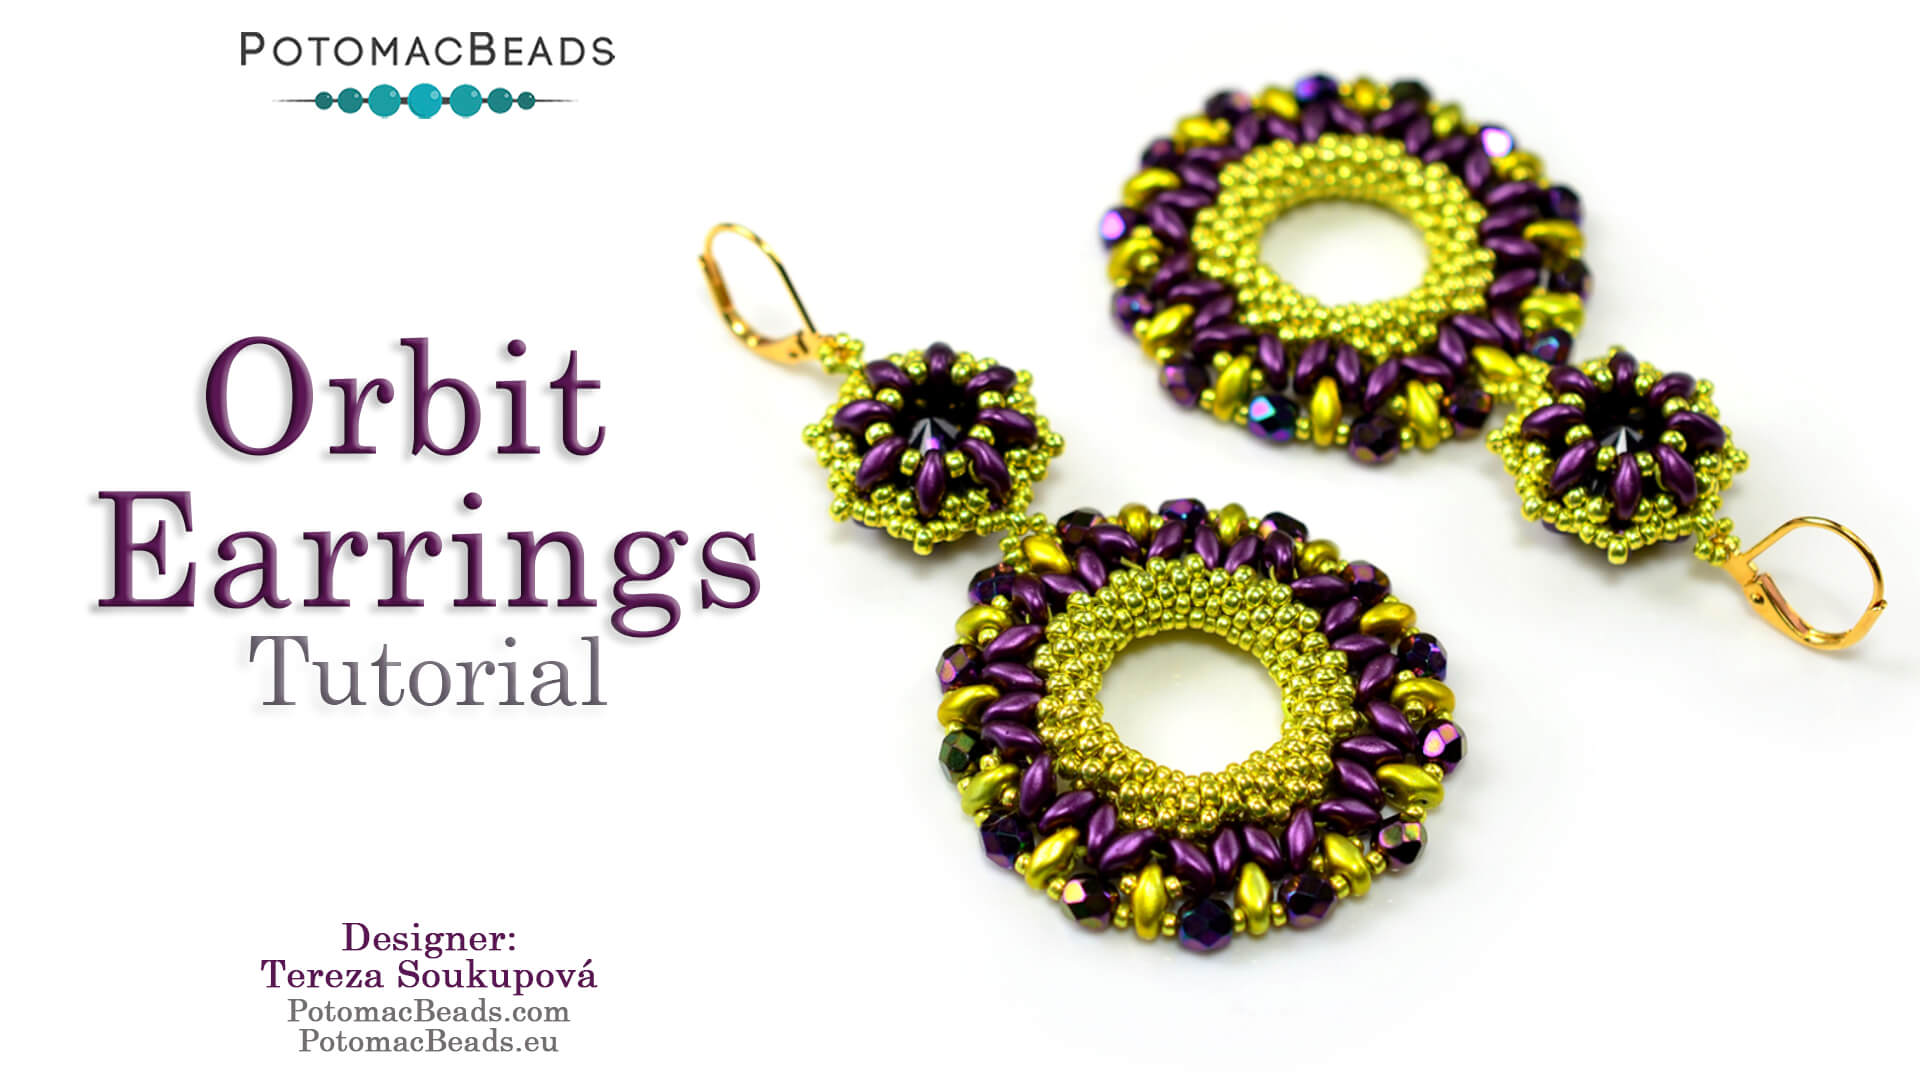 How to Bead / Videos Sorted by Beads / Potomac Crystal Videos / Orbit Earrings Tutorial